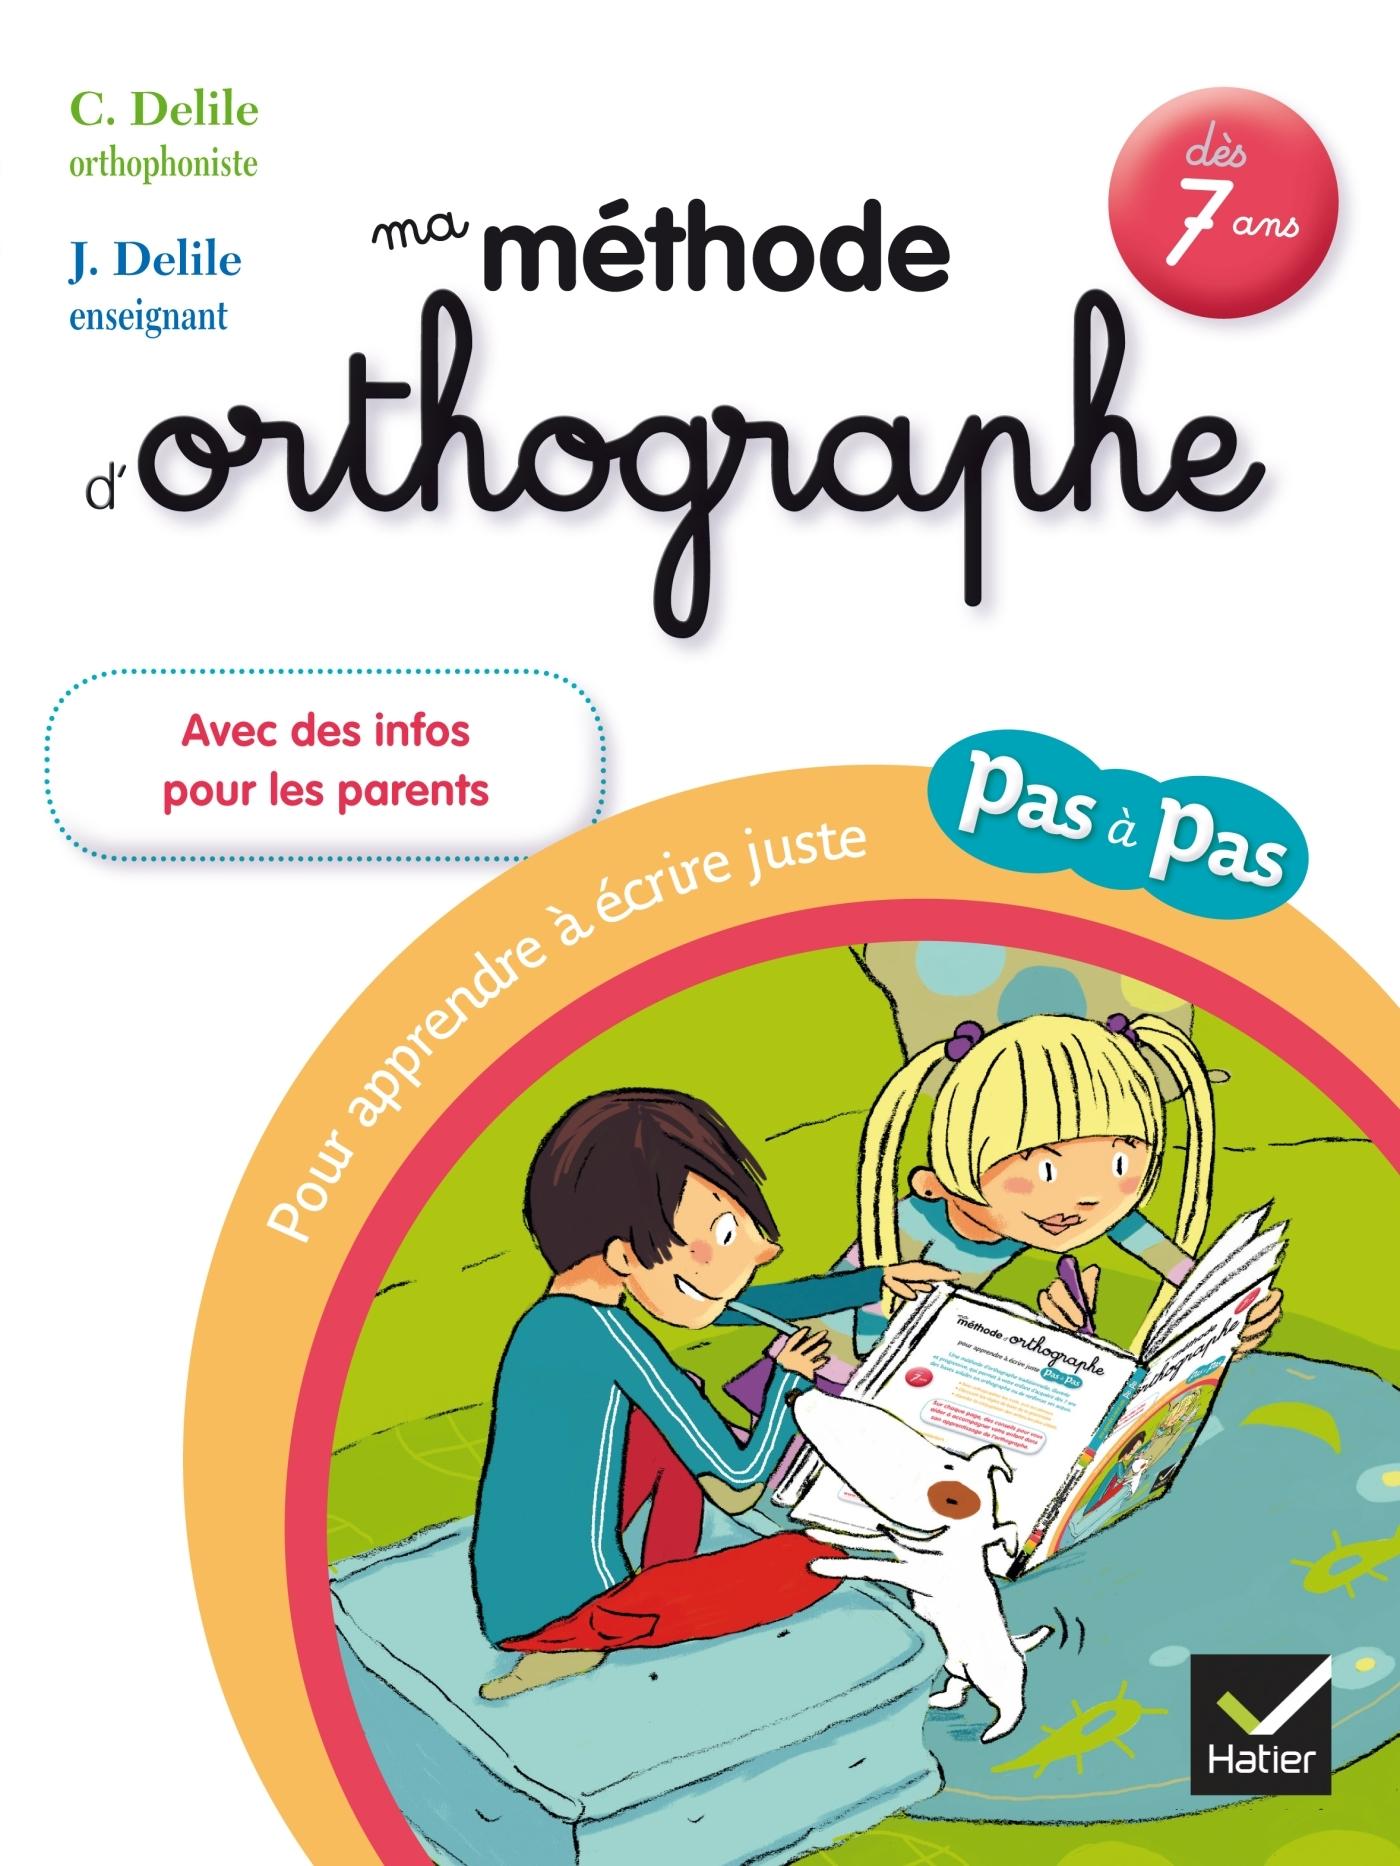 MA METHODE D'ORTHOGRAPHE